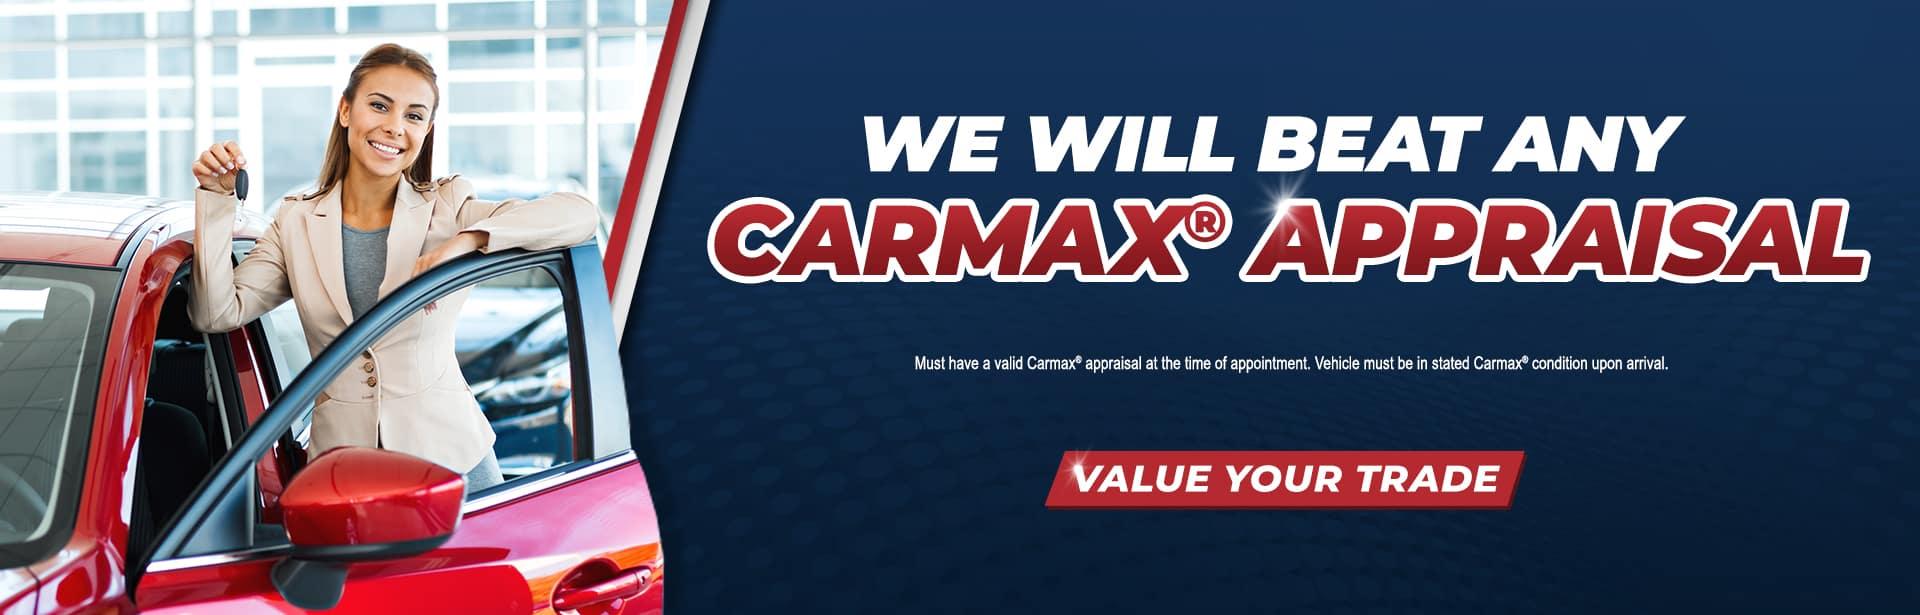 1MCT_CarmaxAppraisal_Slide_1920_615_07-21